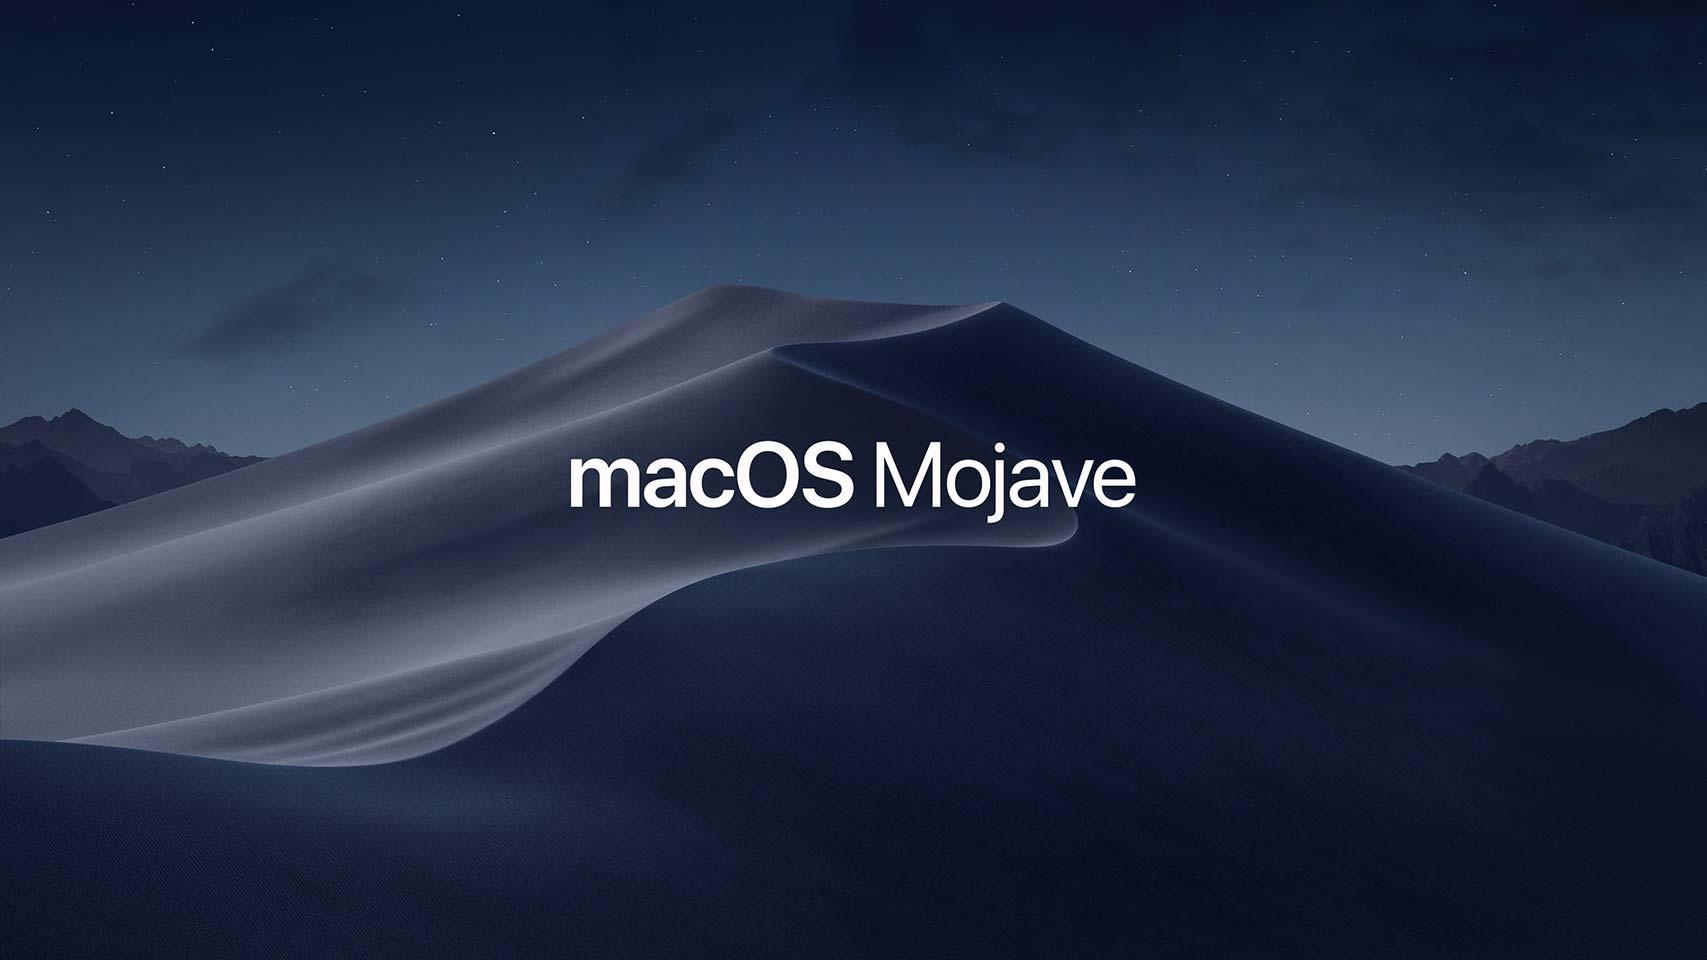 macOS-10.14-Mojave-Night-hero-hero.jpg